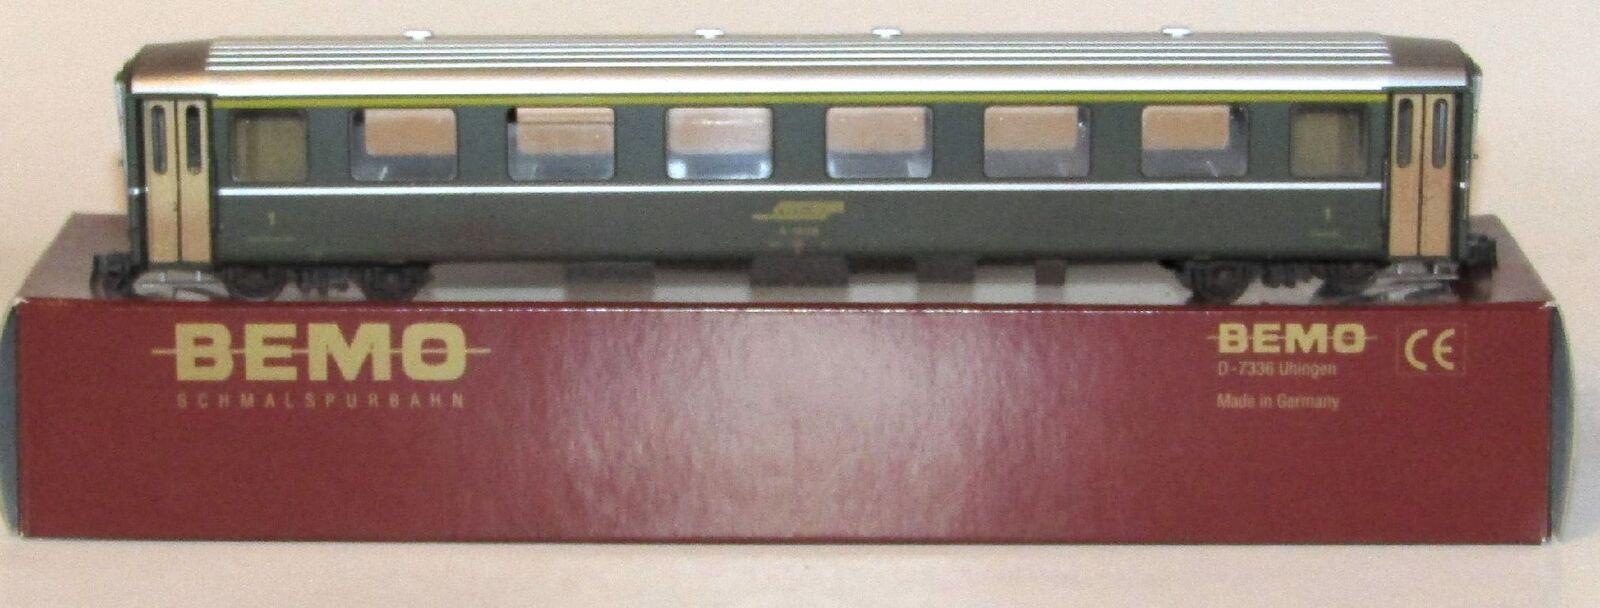 BEMO RHB entitEspecificata-Vagoni 1. KL. a 1226 verde, h0m, art.3252 215, OVP